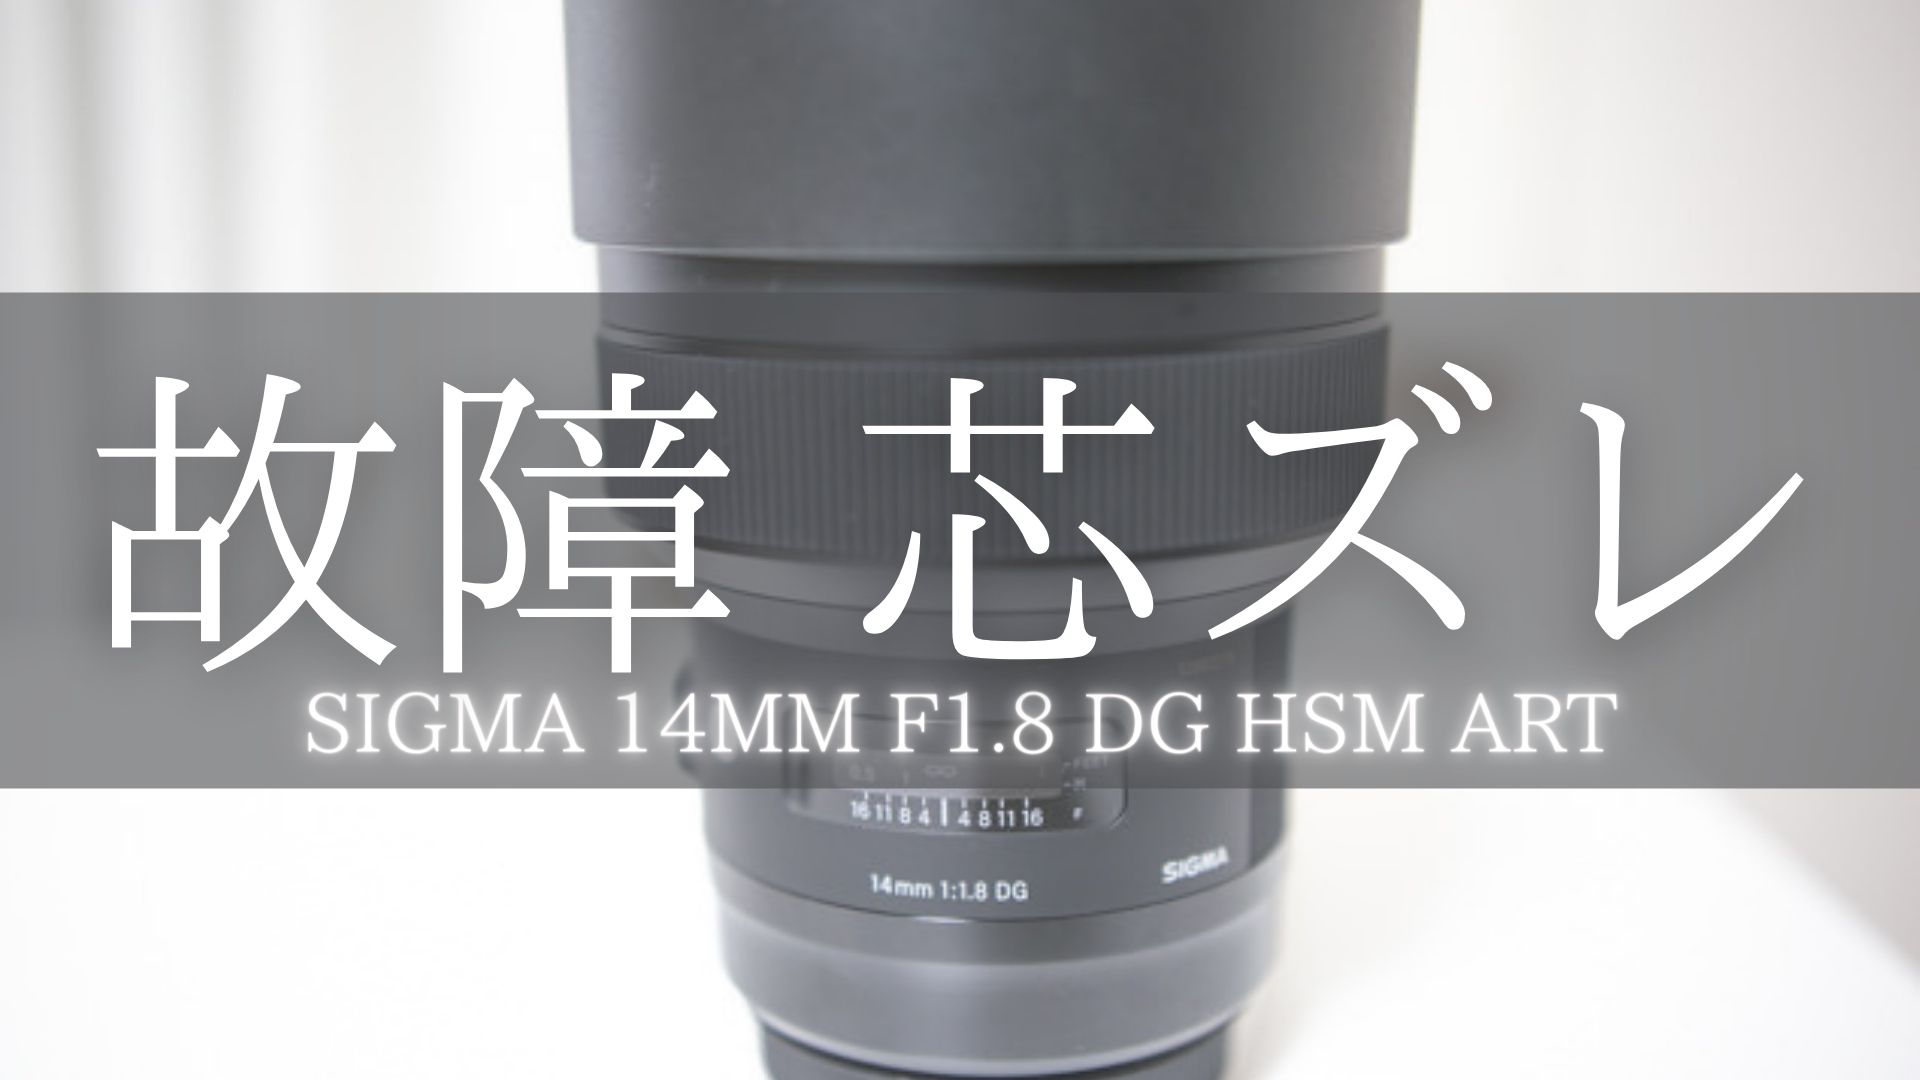 SIGMA 14mm F1.8 DG HSM ART 解像感の低下。芯ズレか?症状と故障原因